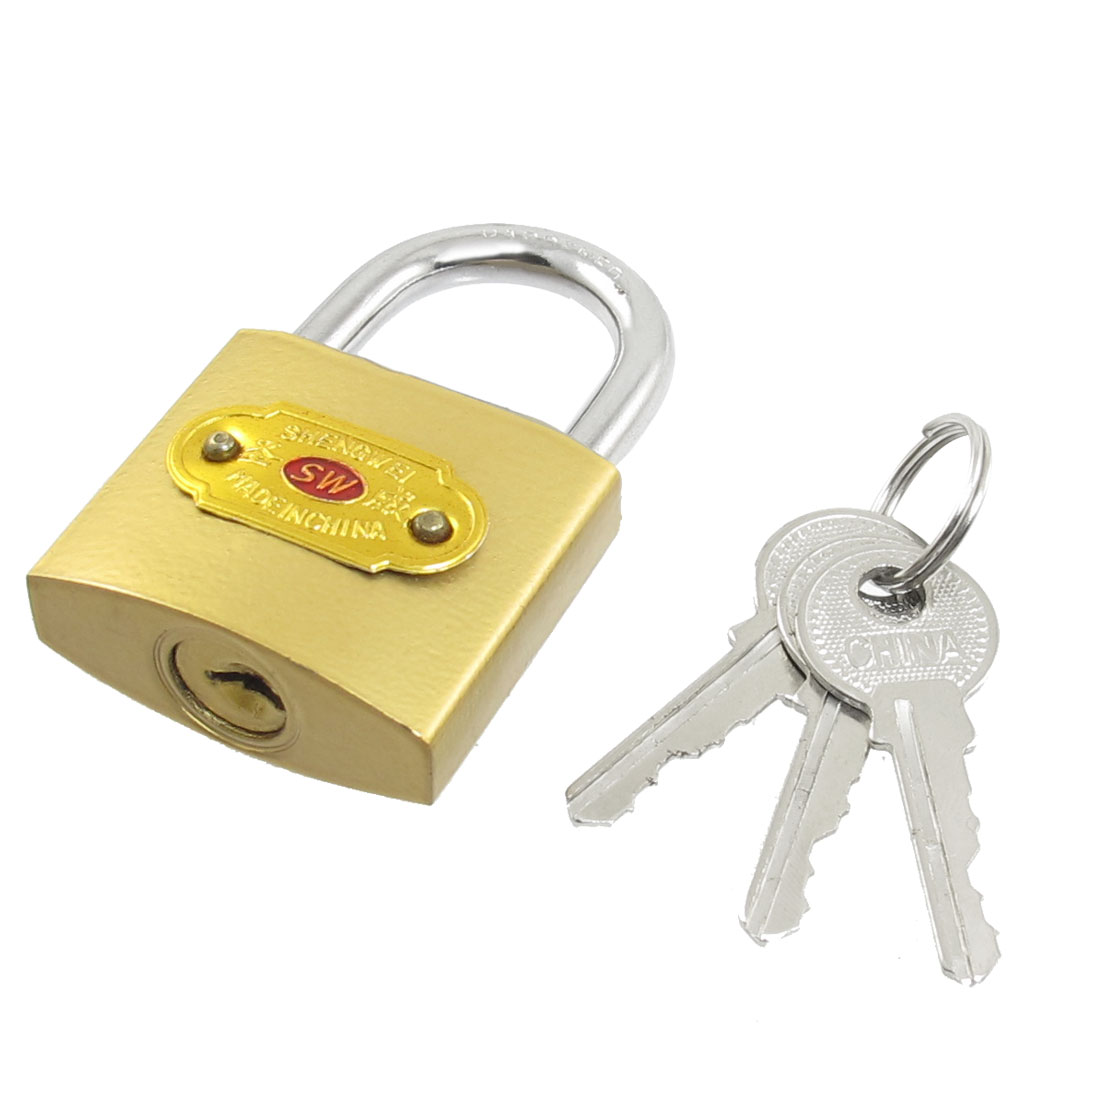 "Cabinet Jewlery Box Packsack Brass Padlock 2.3"" Height Gold Tone w Three Keys"